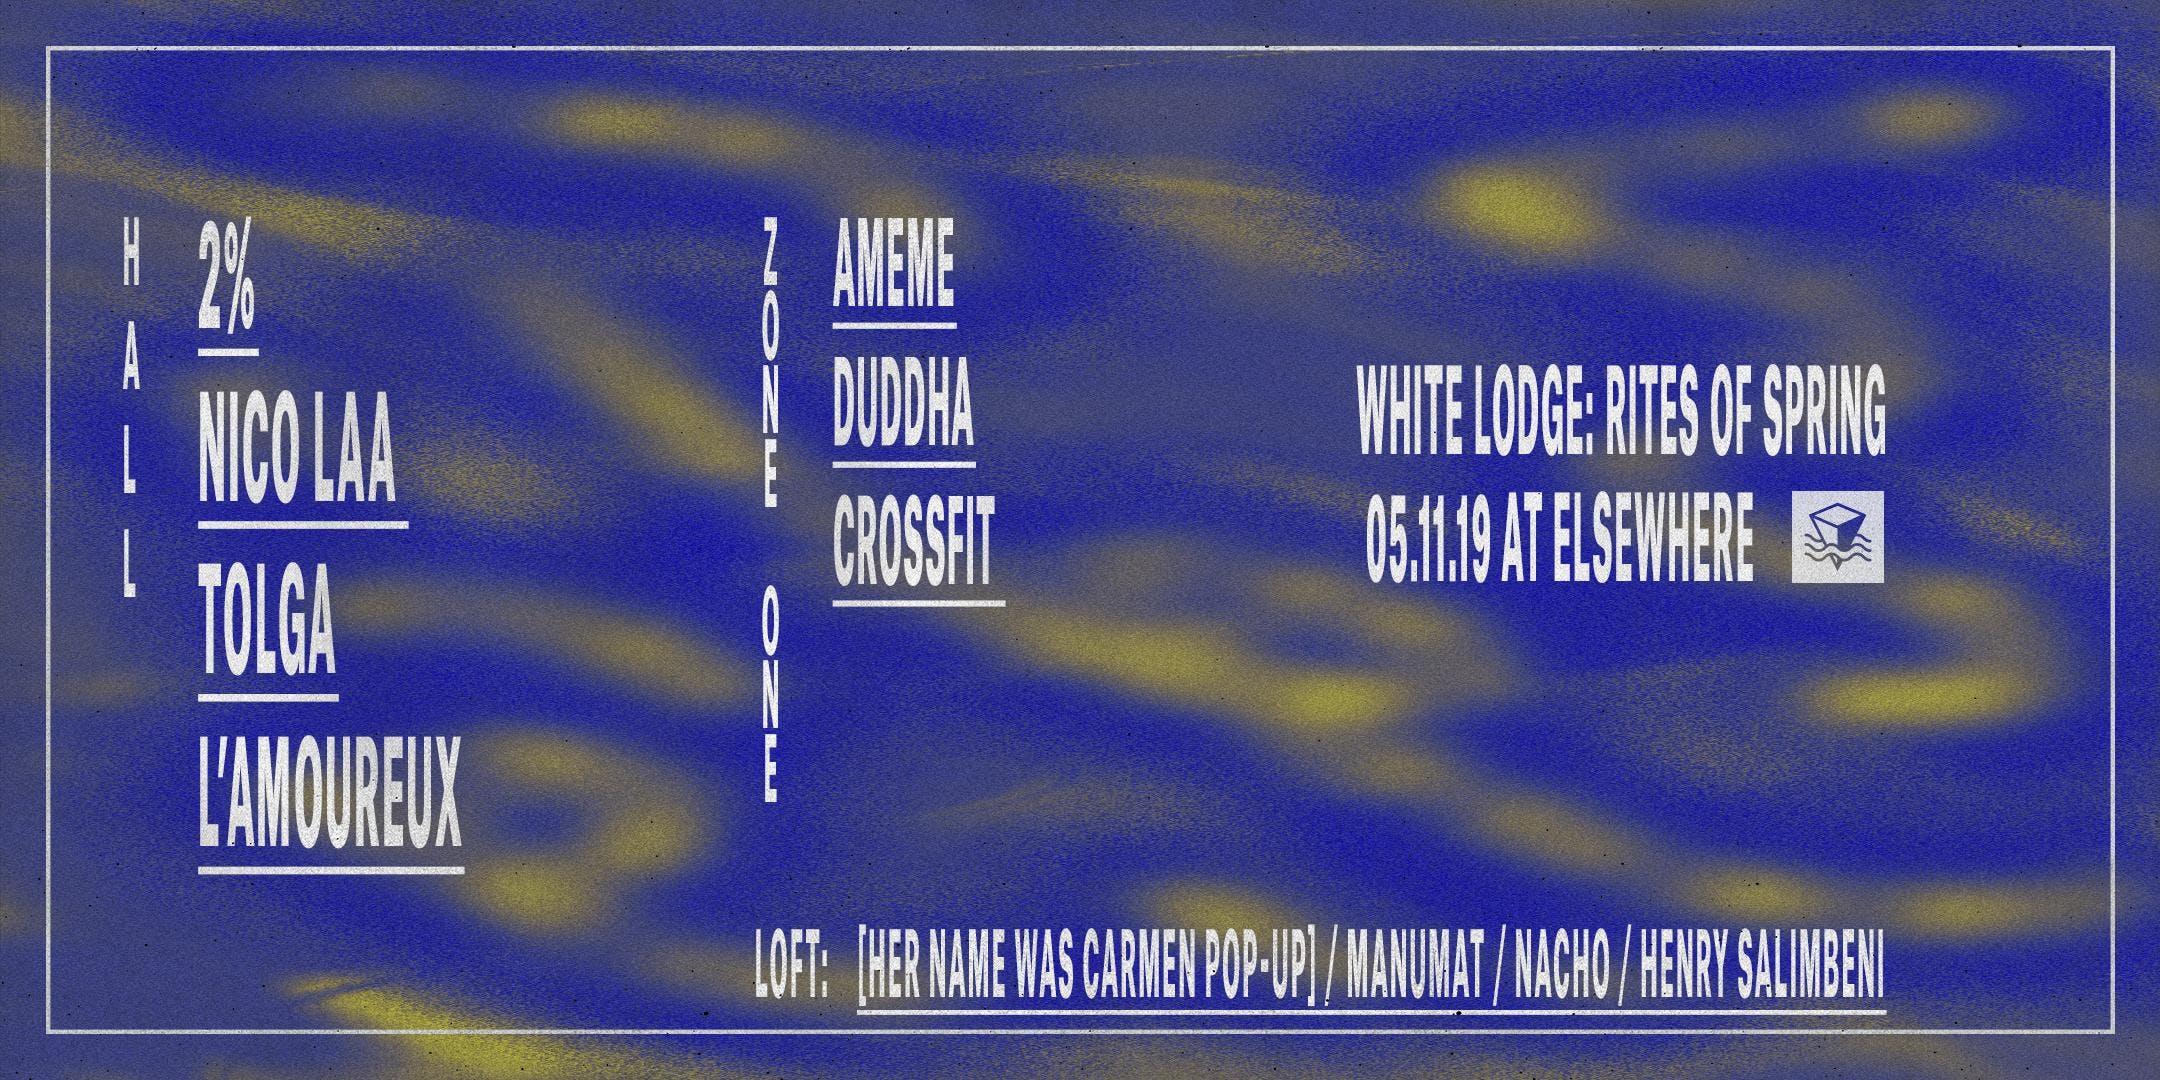 White Lodge: Rites of Spring w/ 2%, Nico Laa,  Tolga, L'amoureux, Ameme, Duddha, CrossFit, Manumat, Nacho & Henry Salimbeni